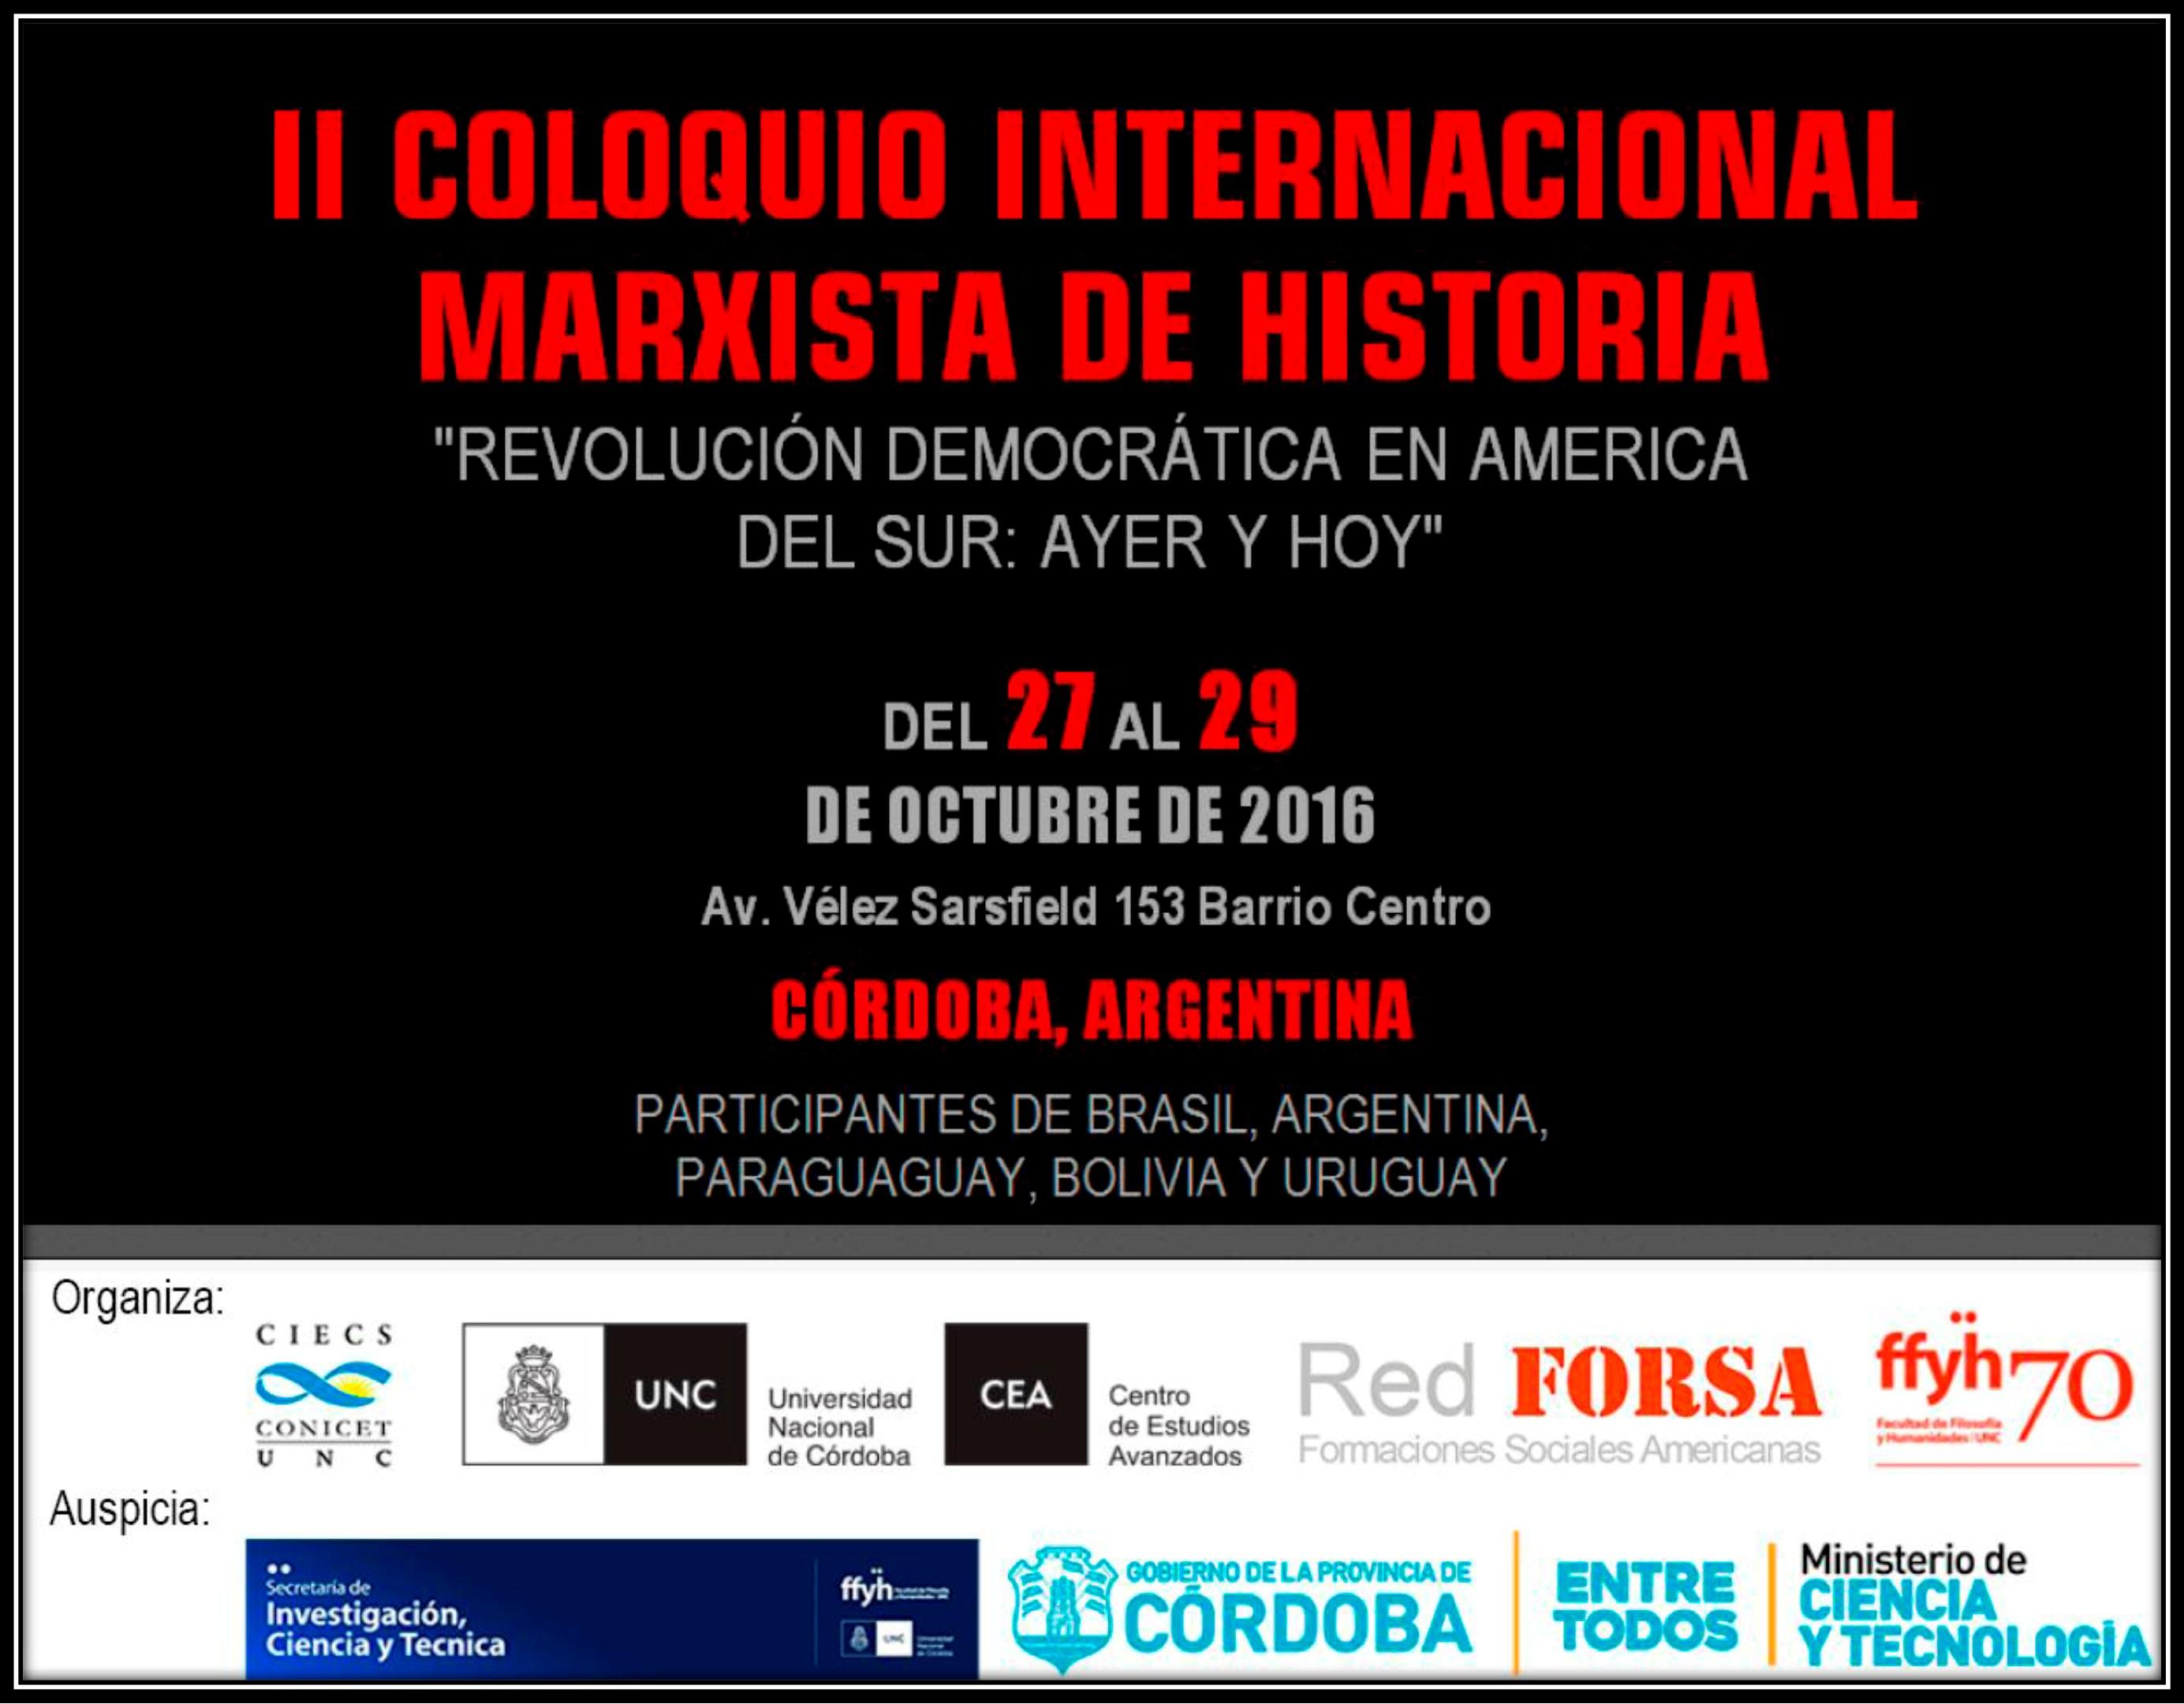 ii-coloquio-internacional-marxista-de-historia